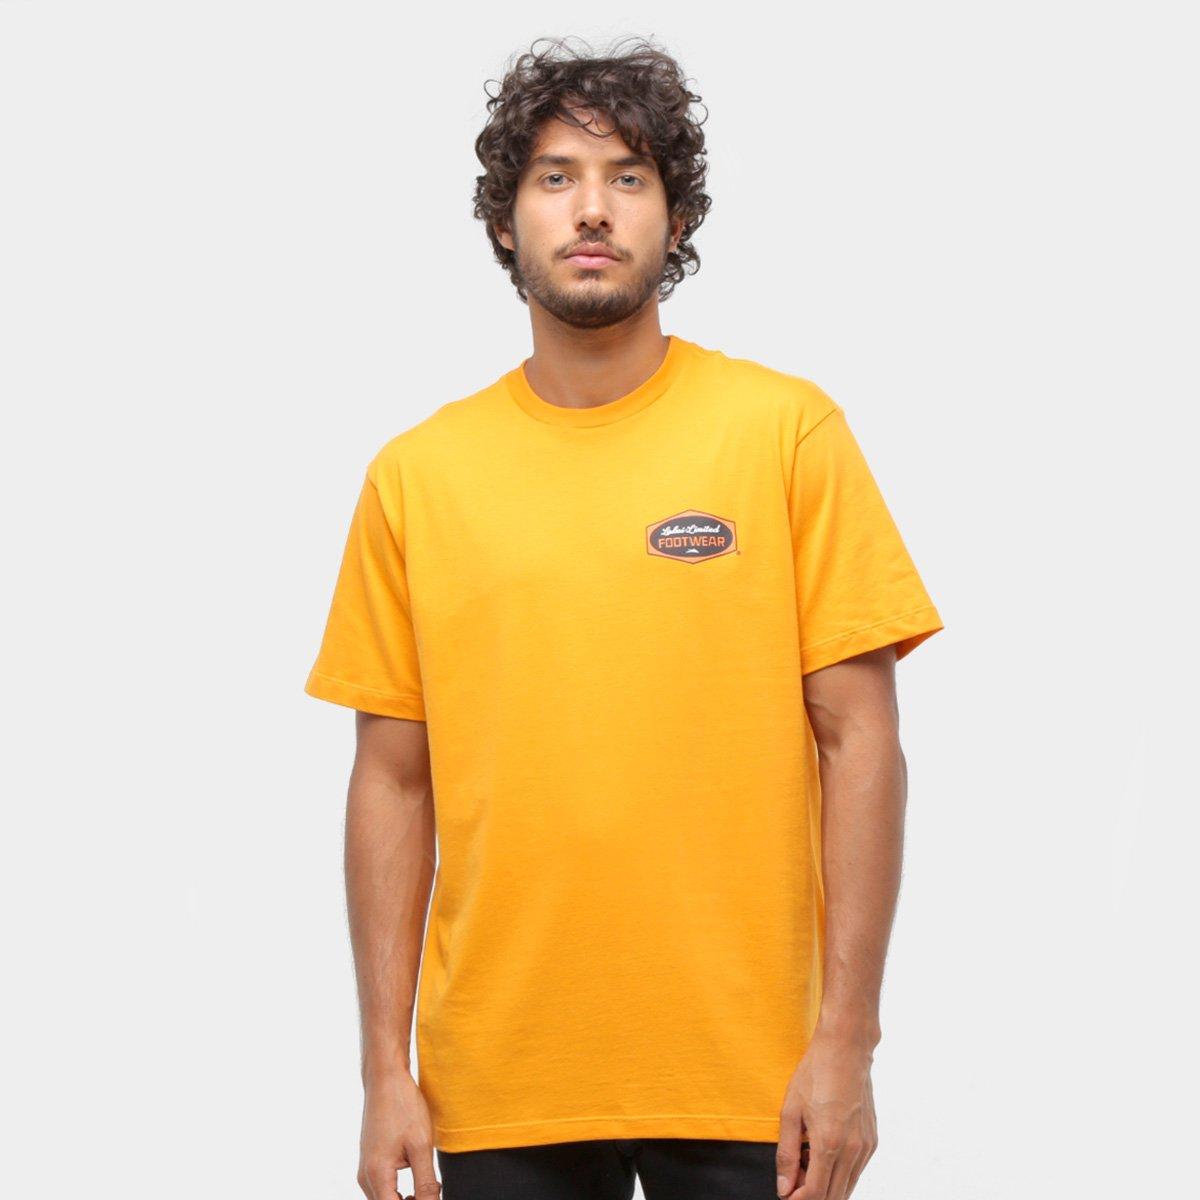 Camiseta Lakai Paint Masculina